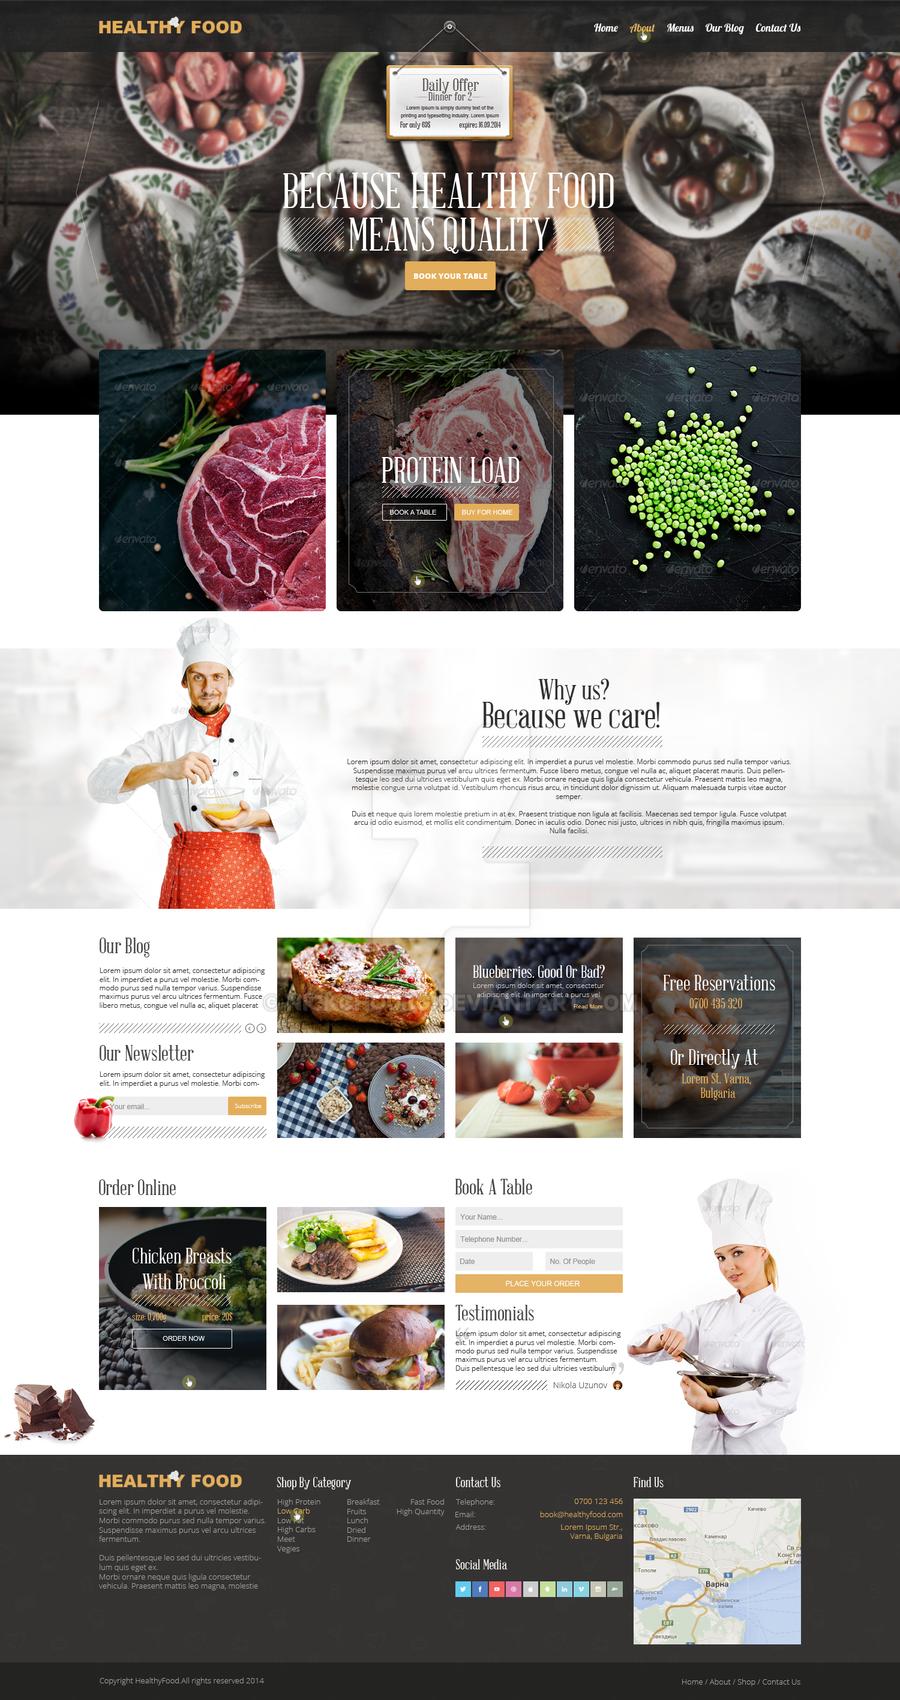 Healthyfood- Web Deisgn by NickchouBG